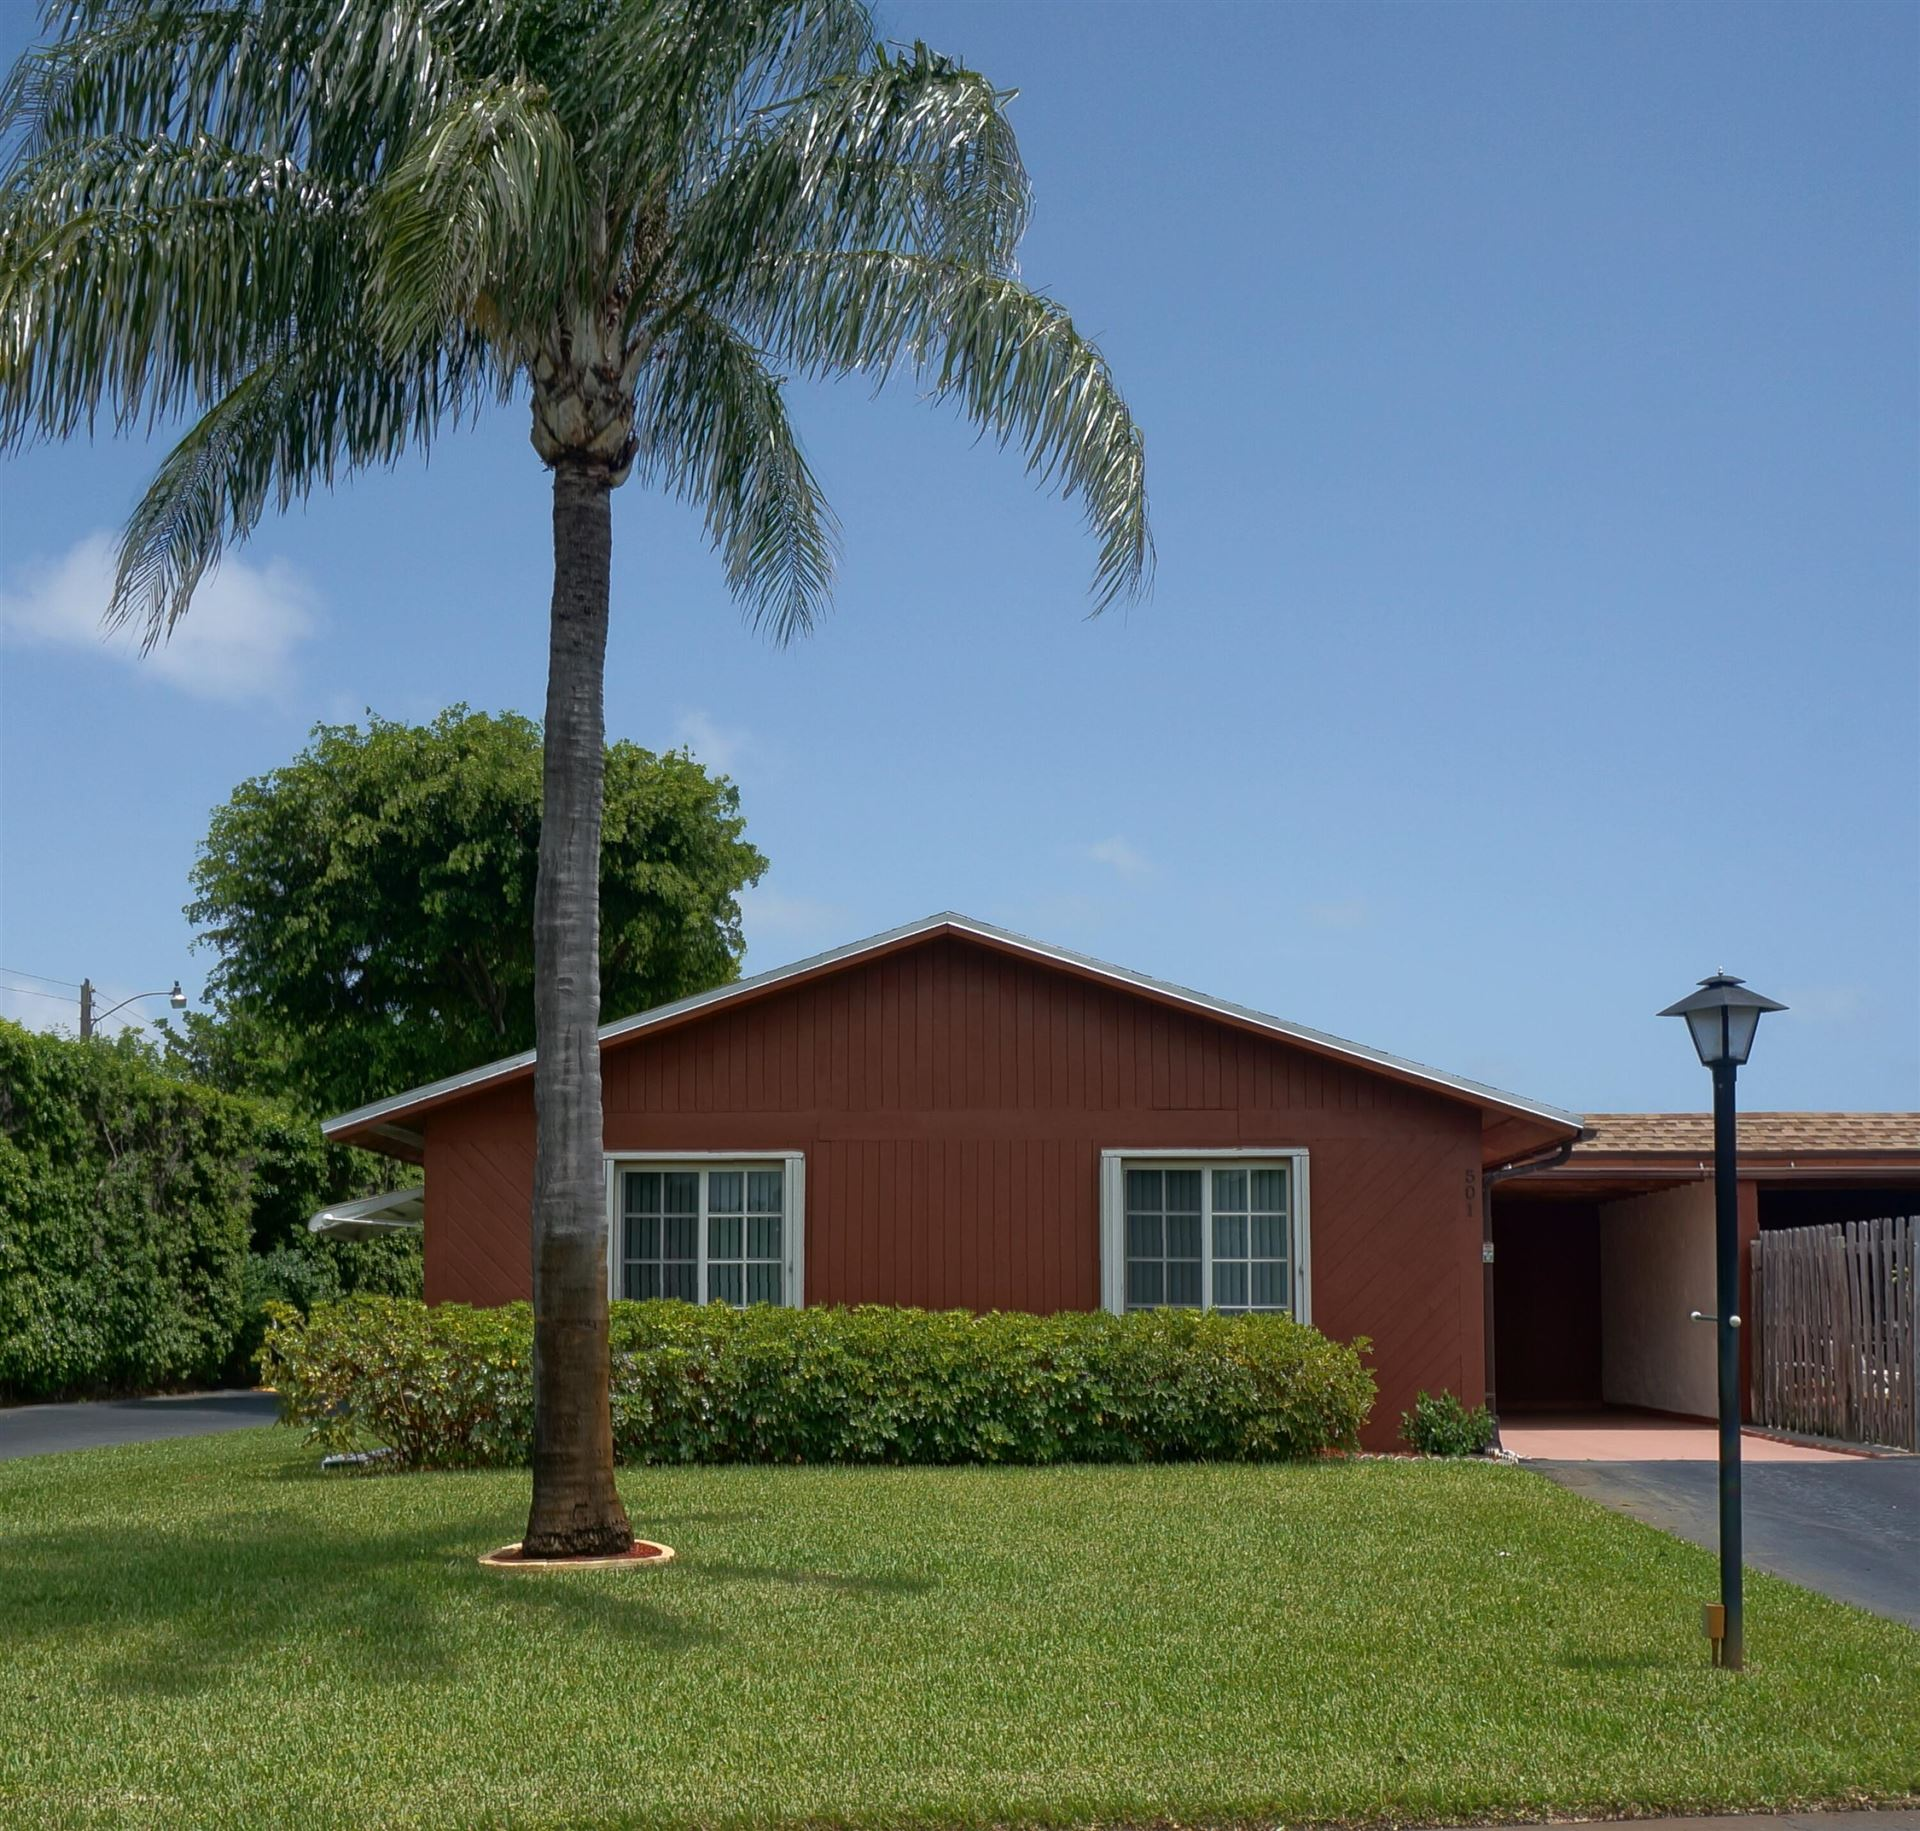 501 SE 27th Lane, Boynton Beach, FL 33435 - MLS#: RX-10730807